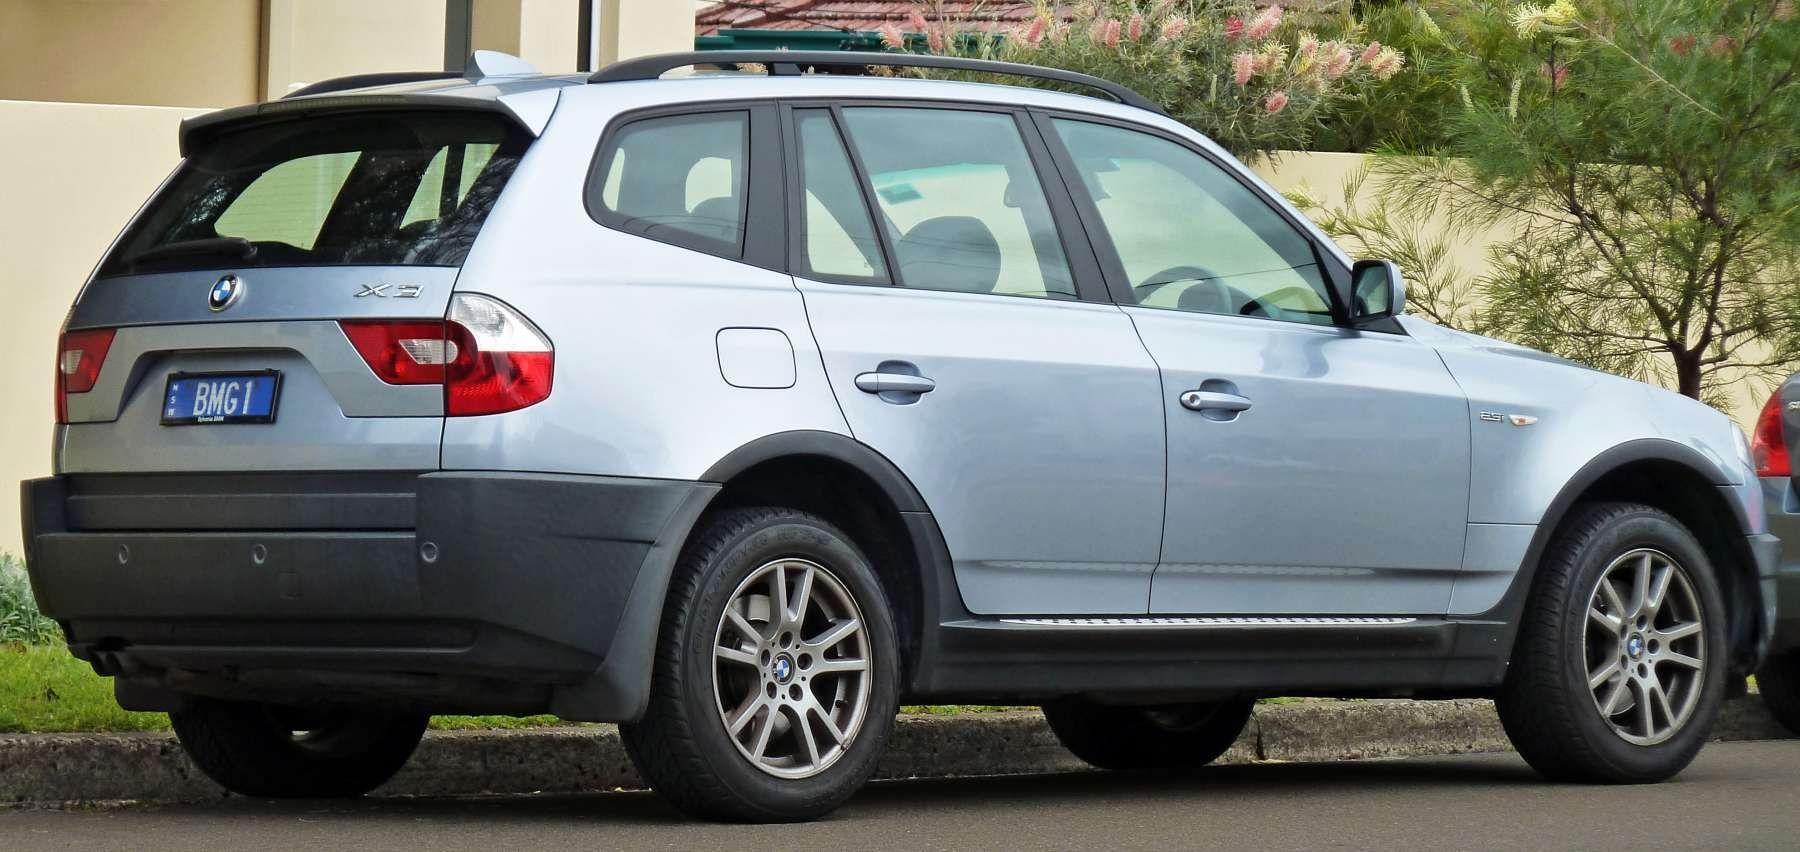 New Black Bmw X F By Ac Schnitzer On A White Background Images Bmw X3 Bmw Car Insurance